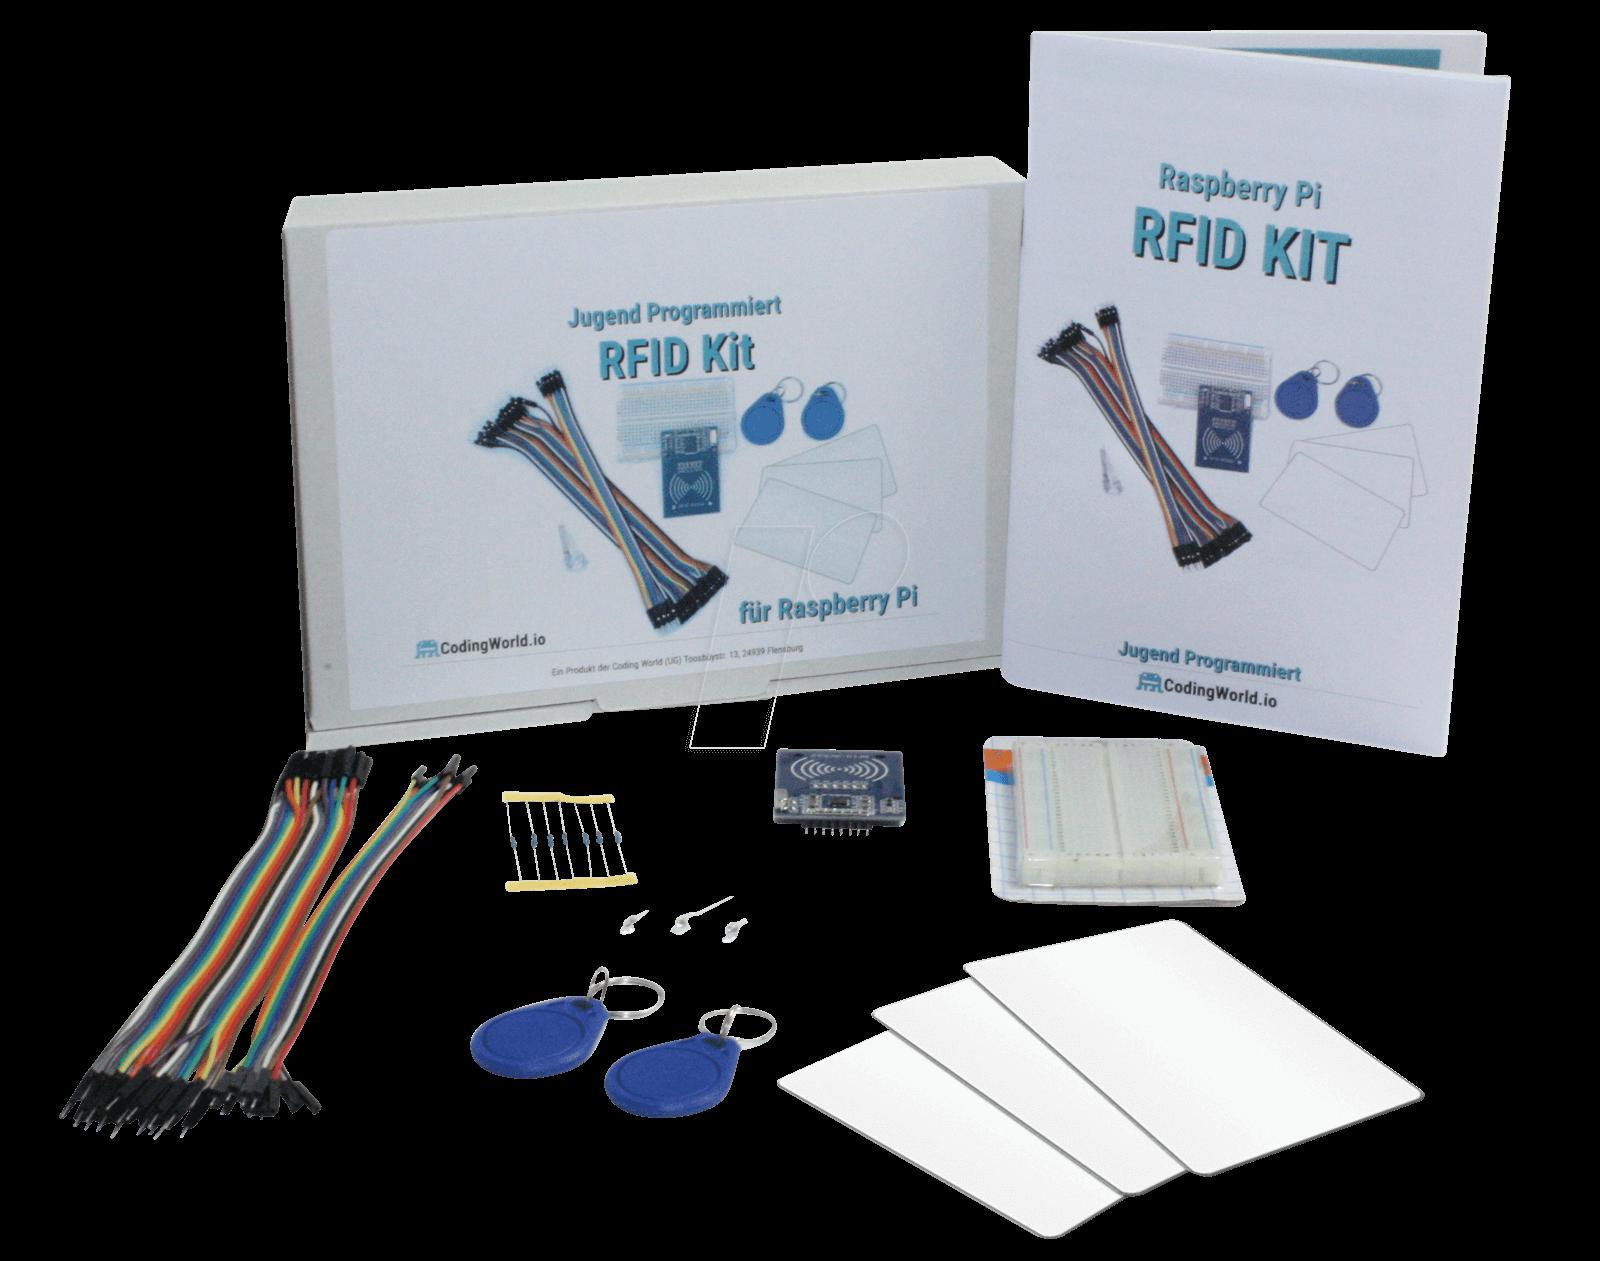 RASP JP RFID - The Teach Kids to Code RFID kit for Raspberry Pi